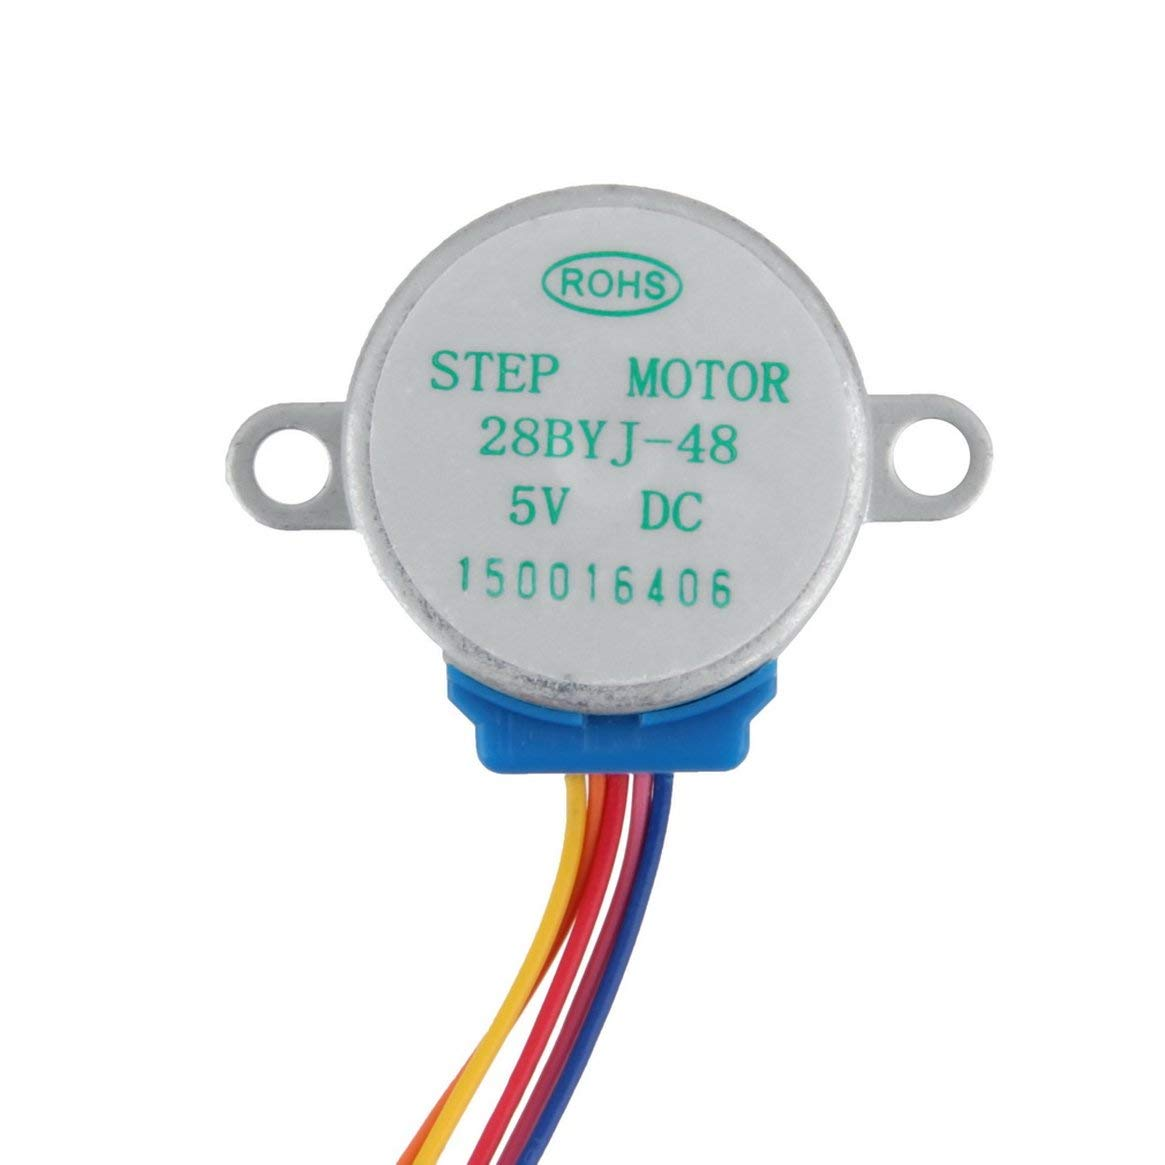 Nuovo Professional 1pcs Gear Stepper Motor DC 5 V 4 fasi Passo Motor Riduzione Step Motor Board Per Arduino